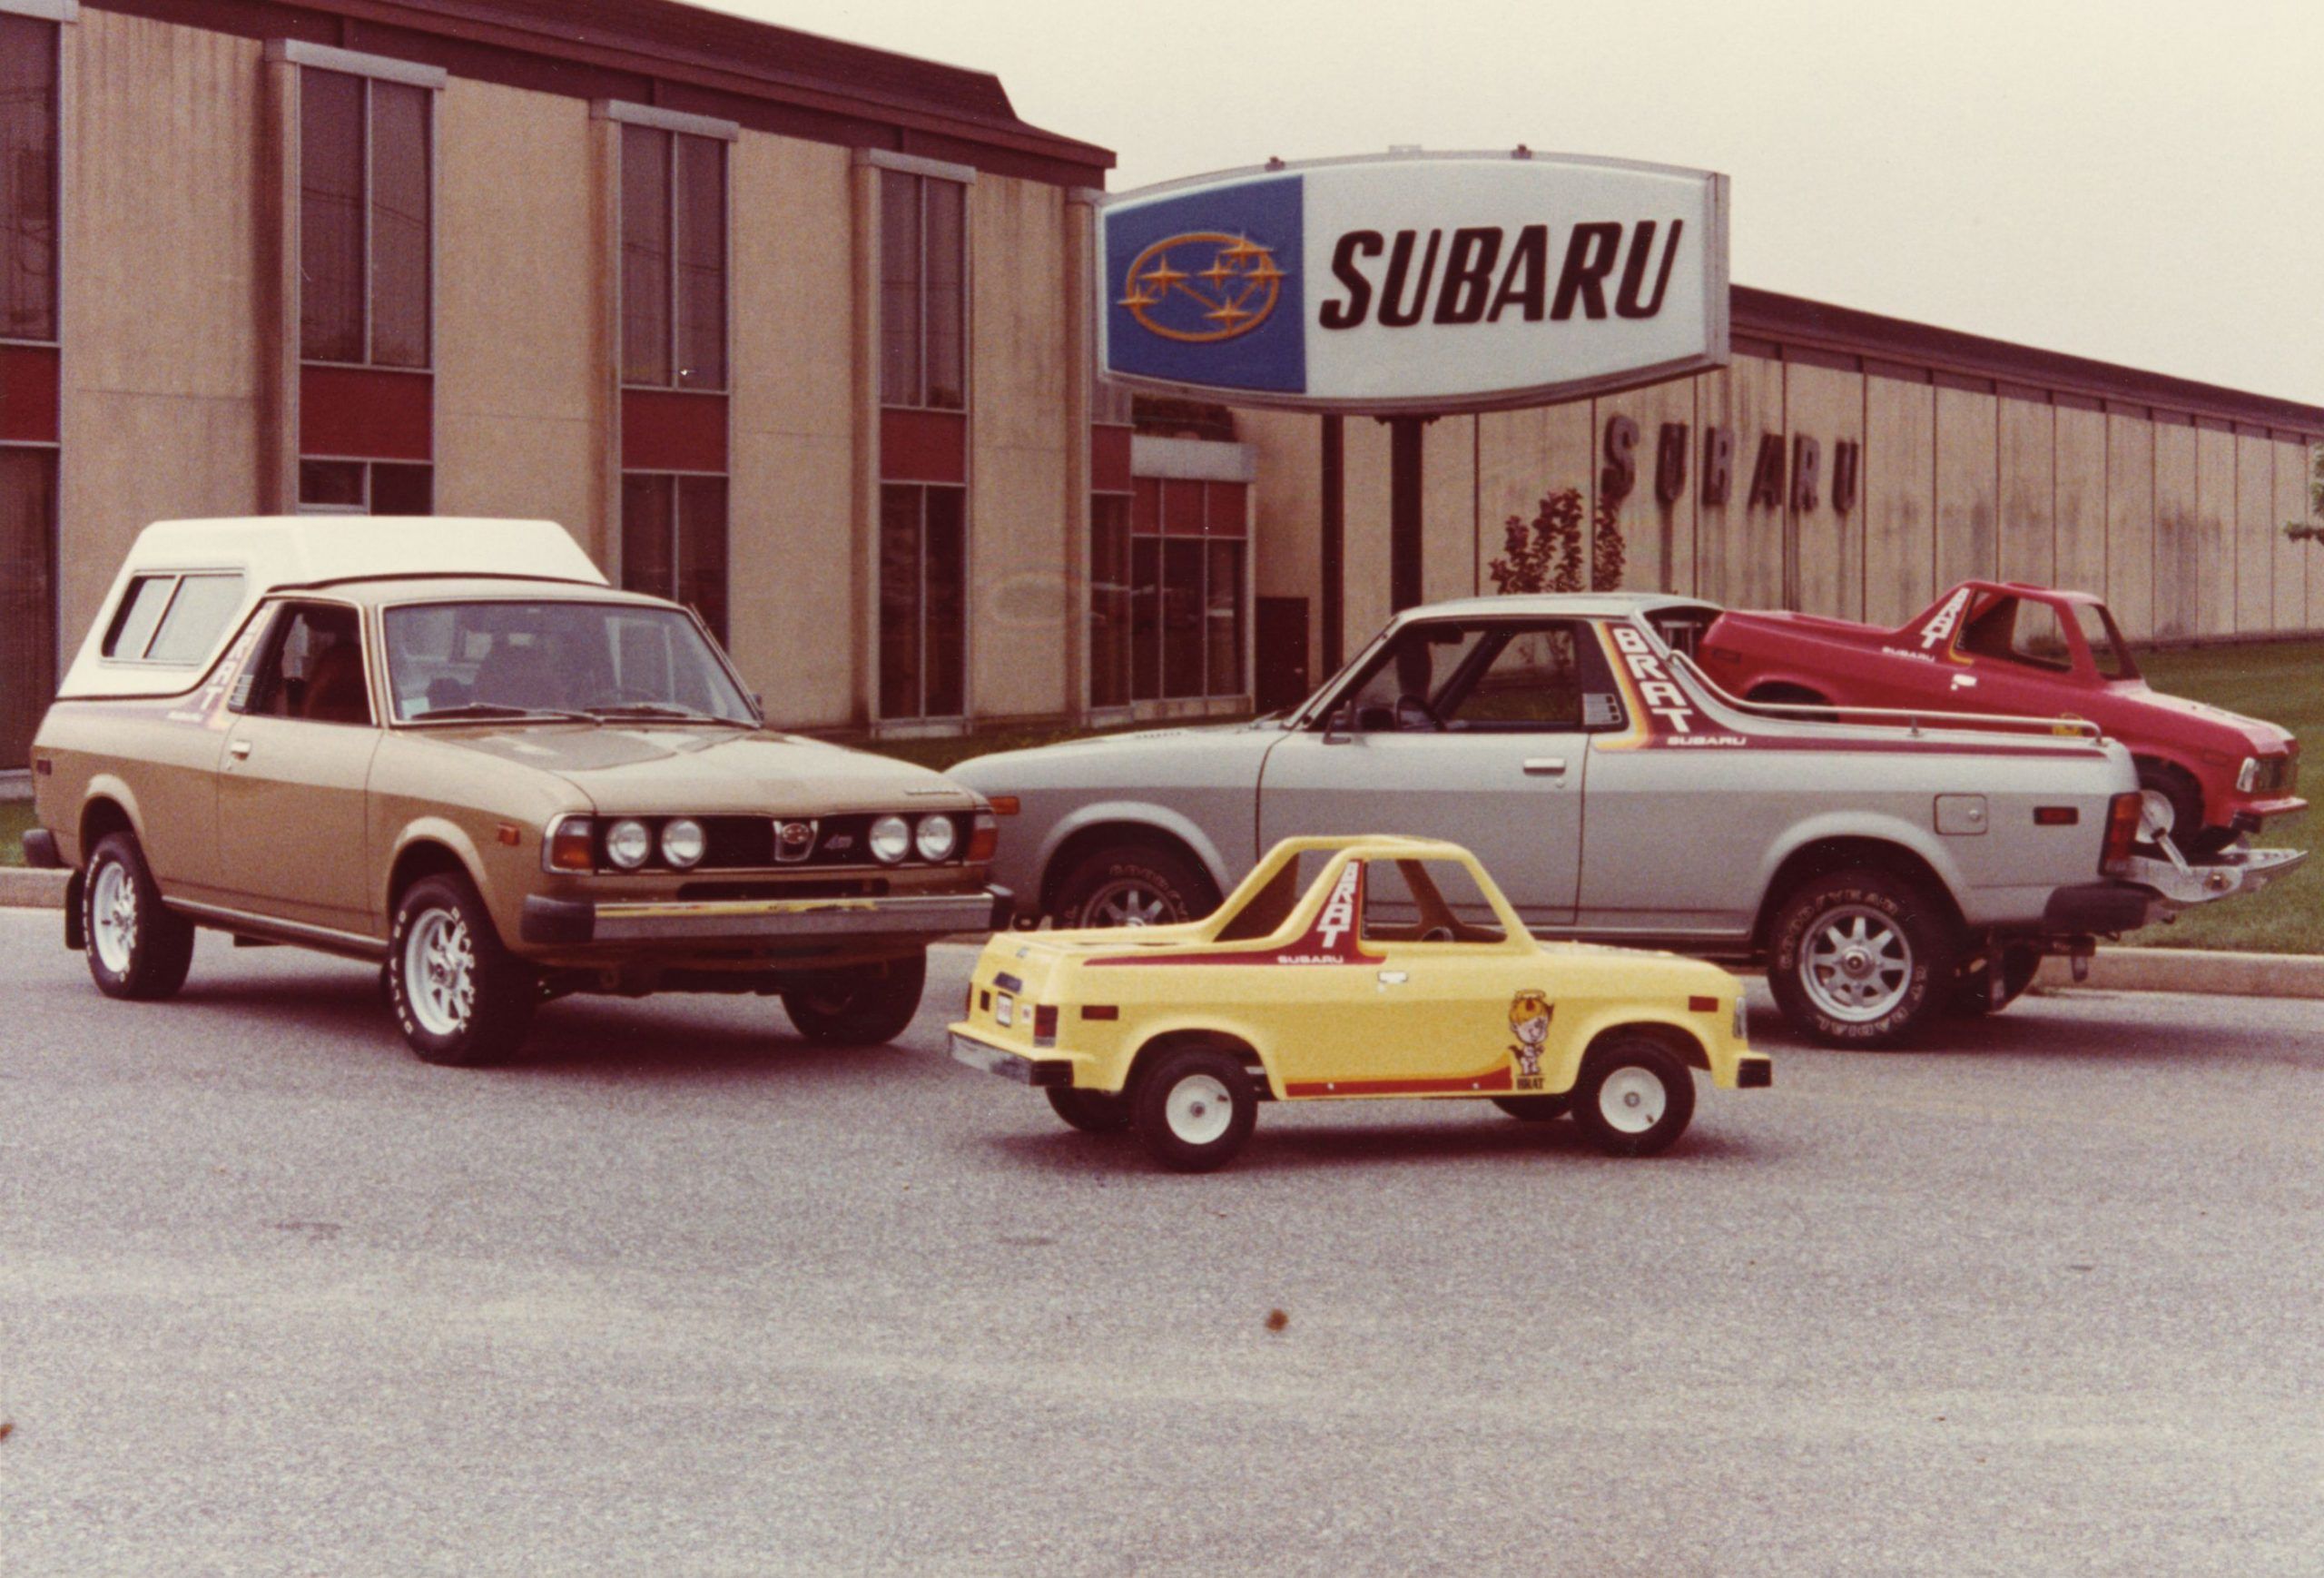 1978 Subaru BRAT vehicles